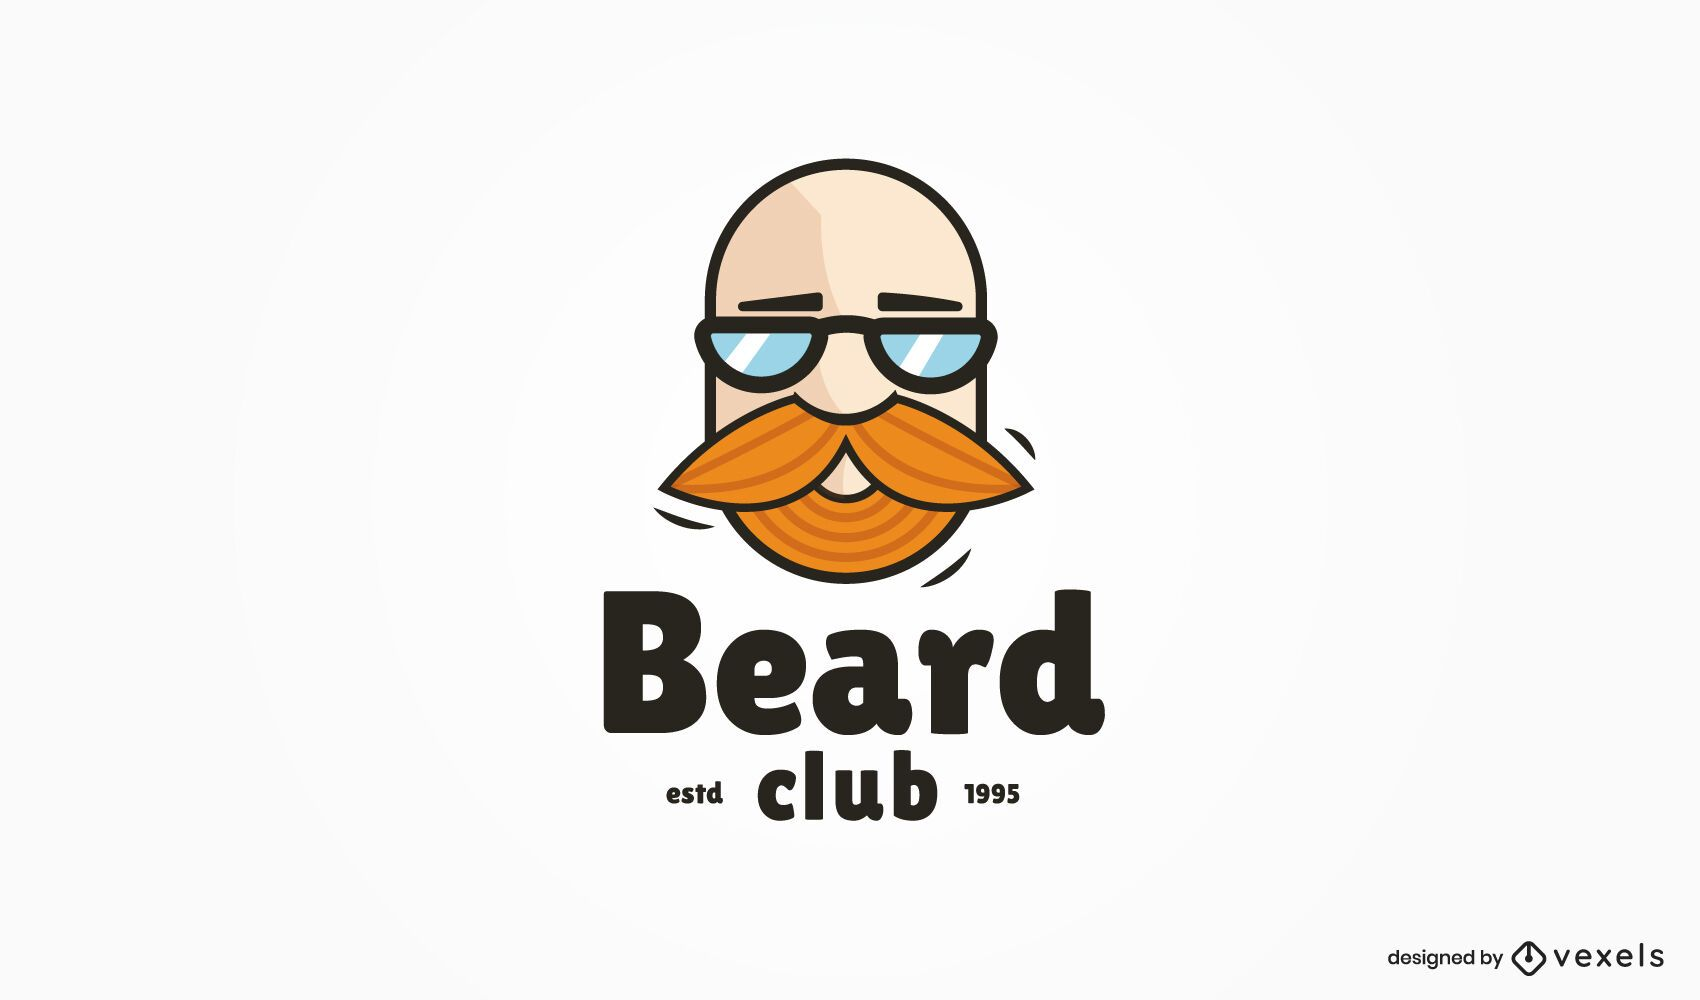 Beard club logo template